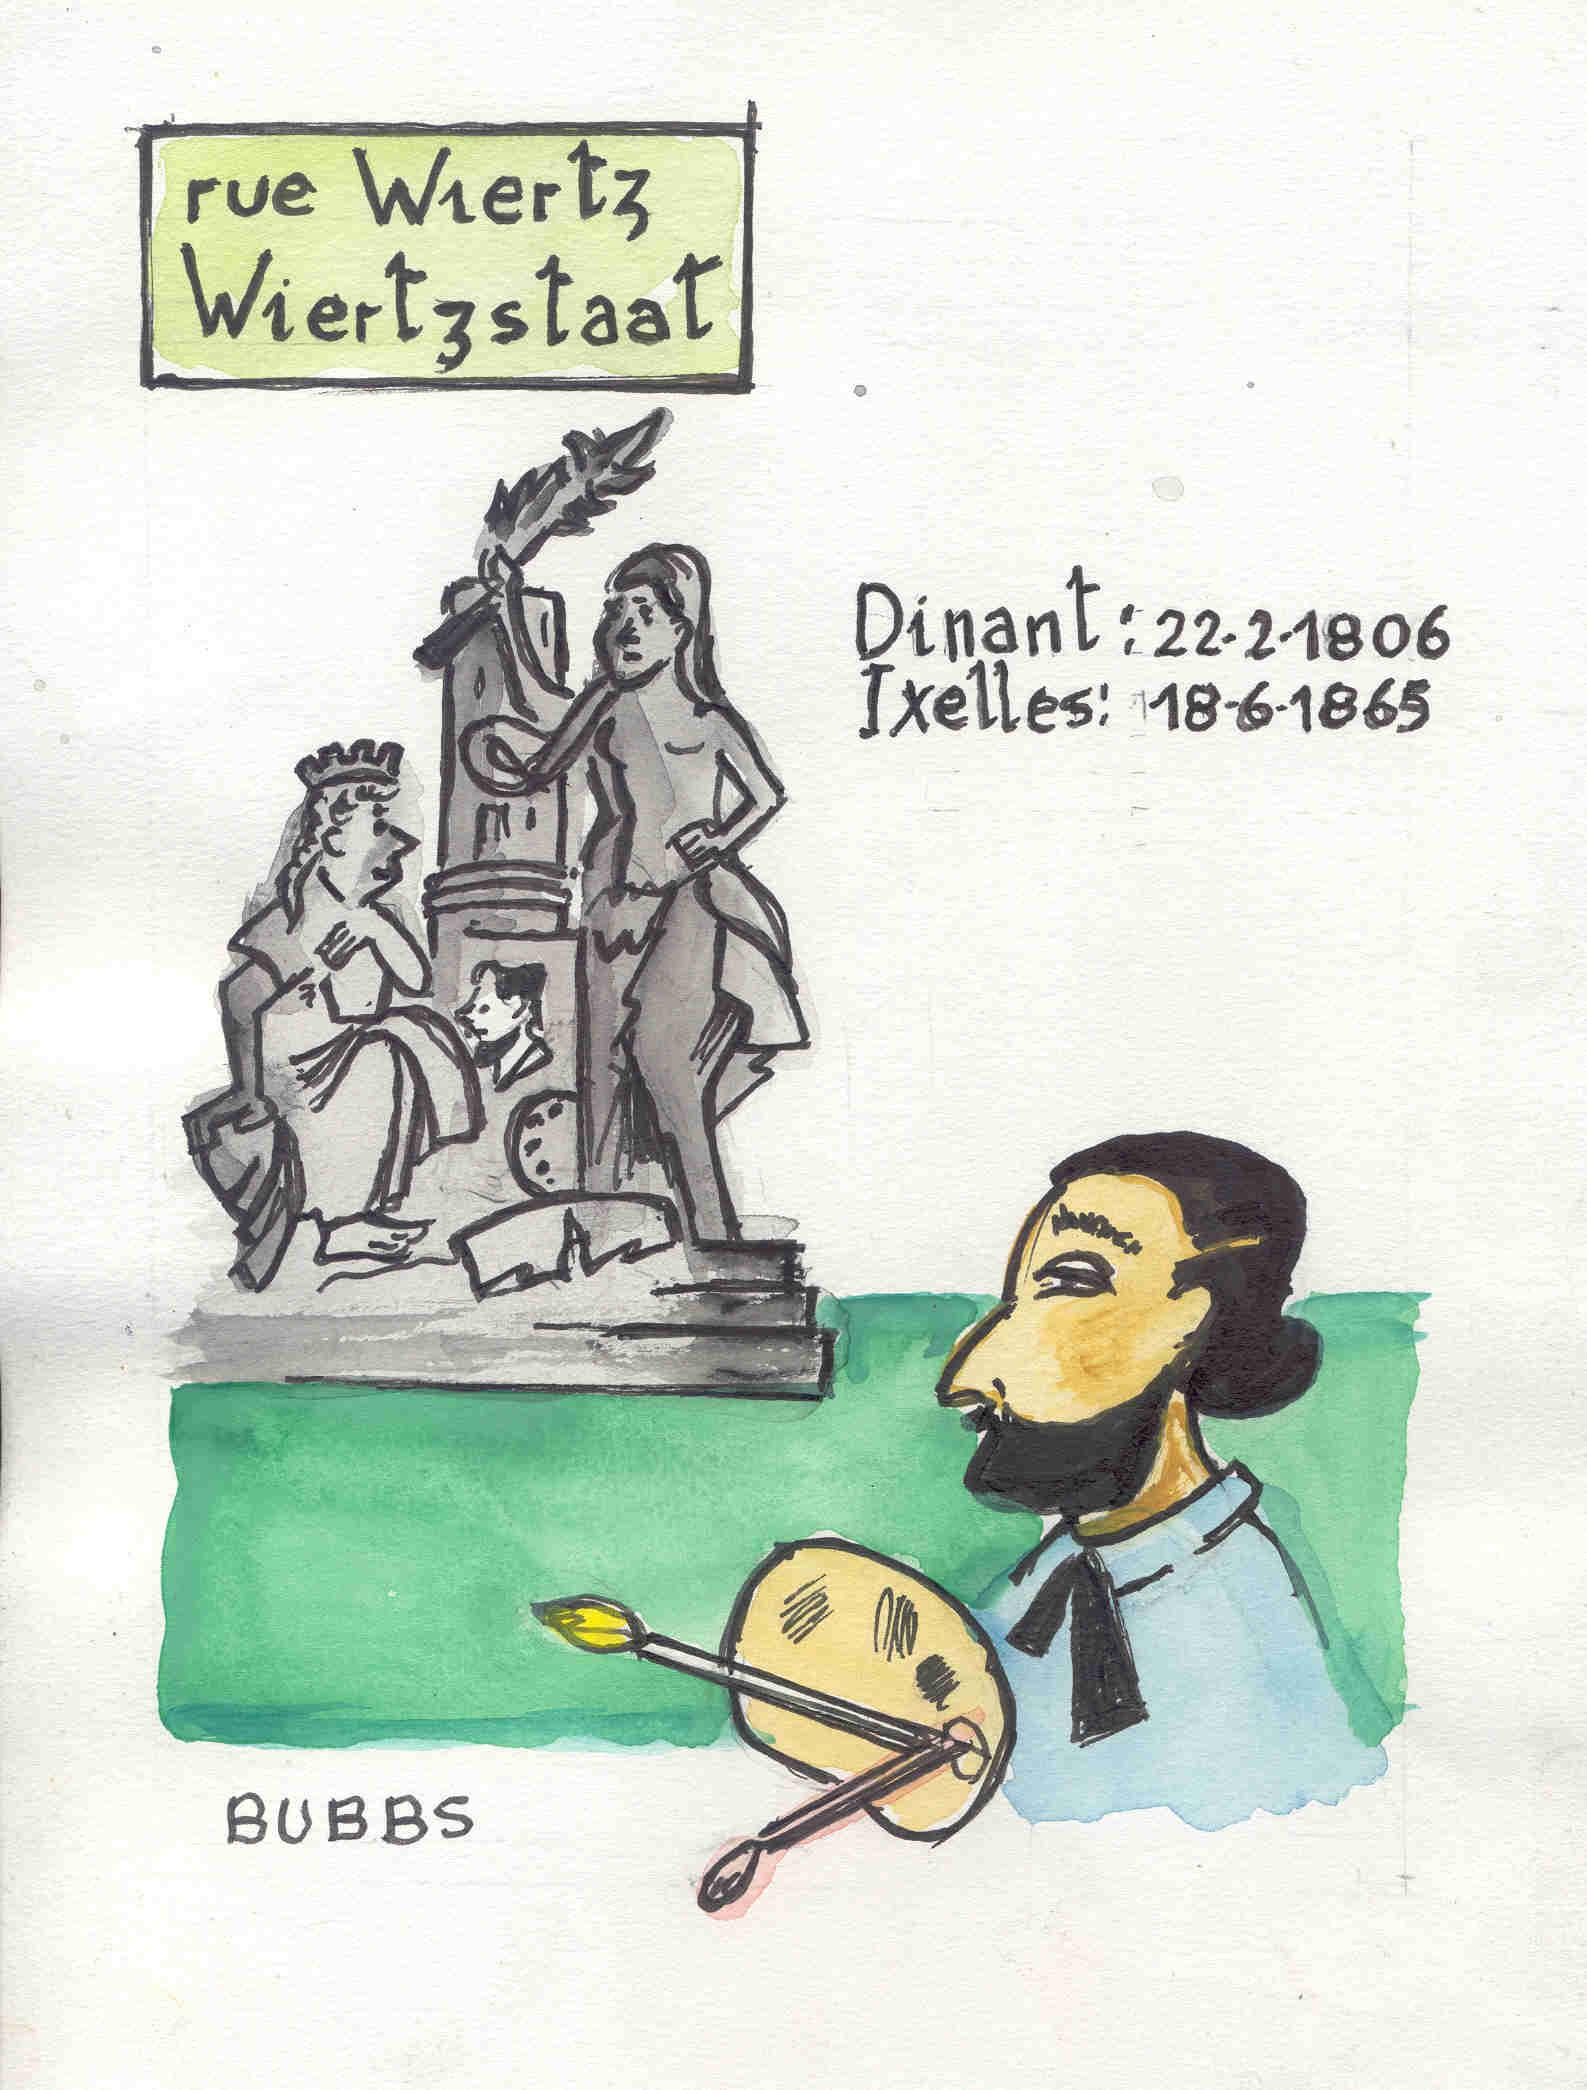 Rue Wiertz par Bubbs